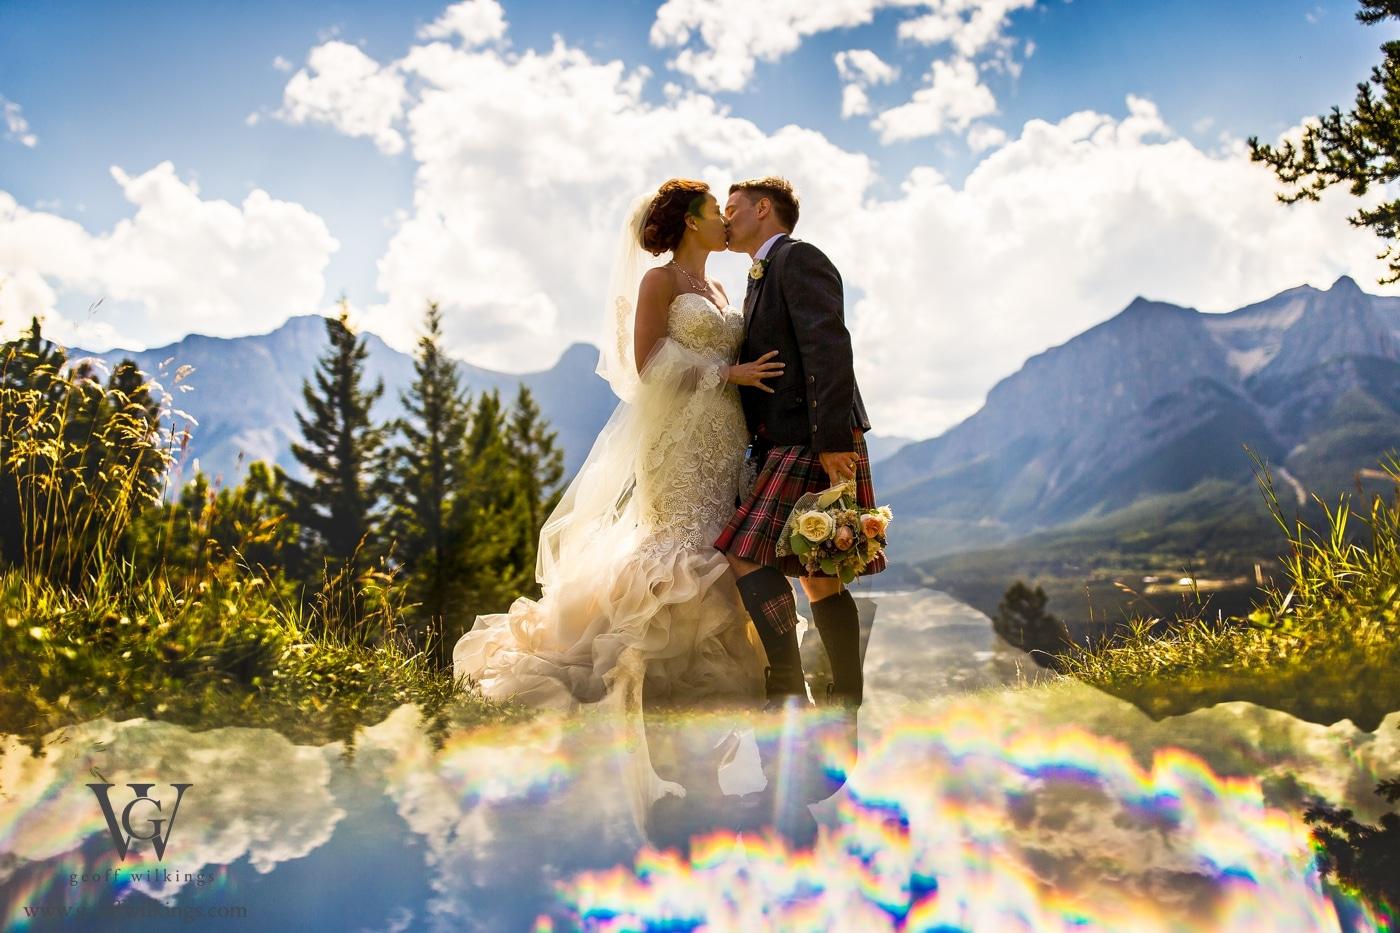 Silvertip wedding photos Calgary wedding photographers Geoff Wilkings Photography_017